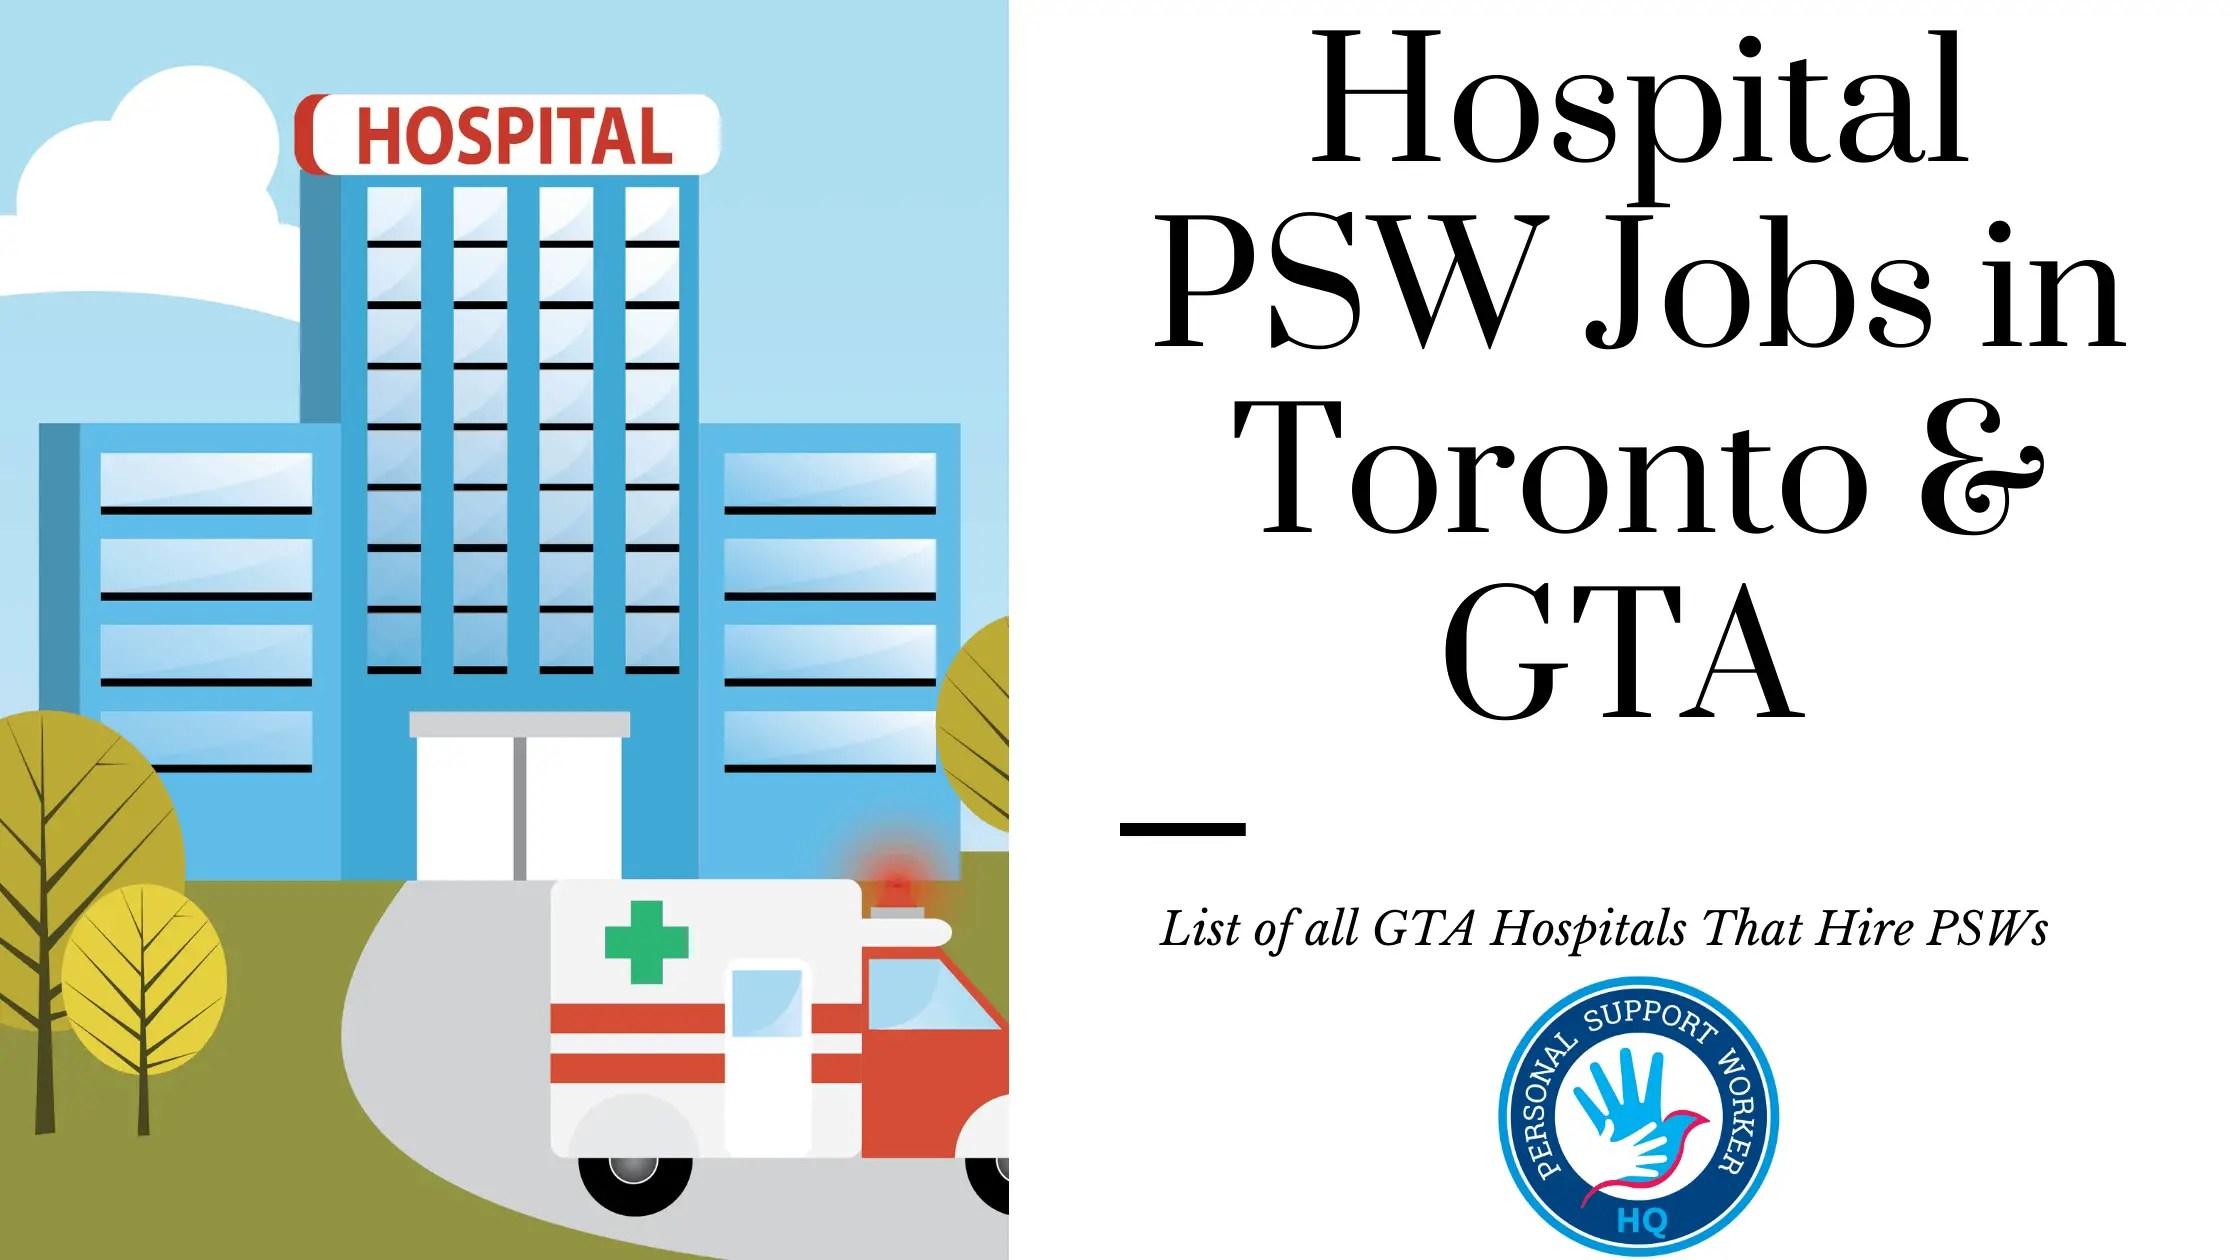 Hospital PSW Jobs in Toronto